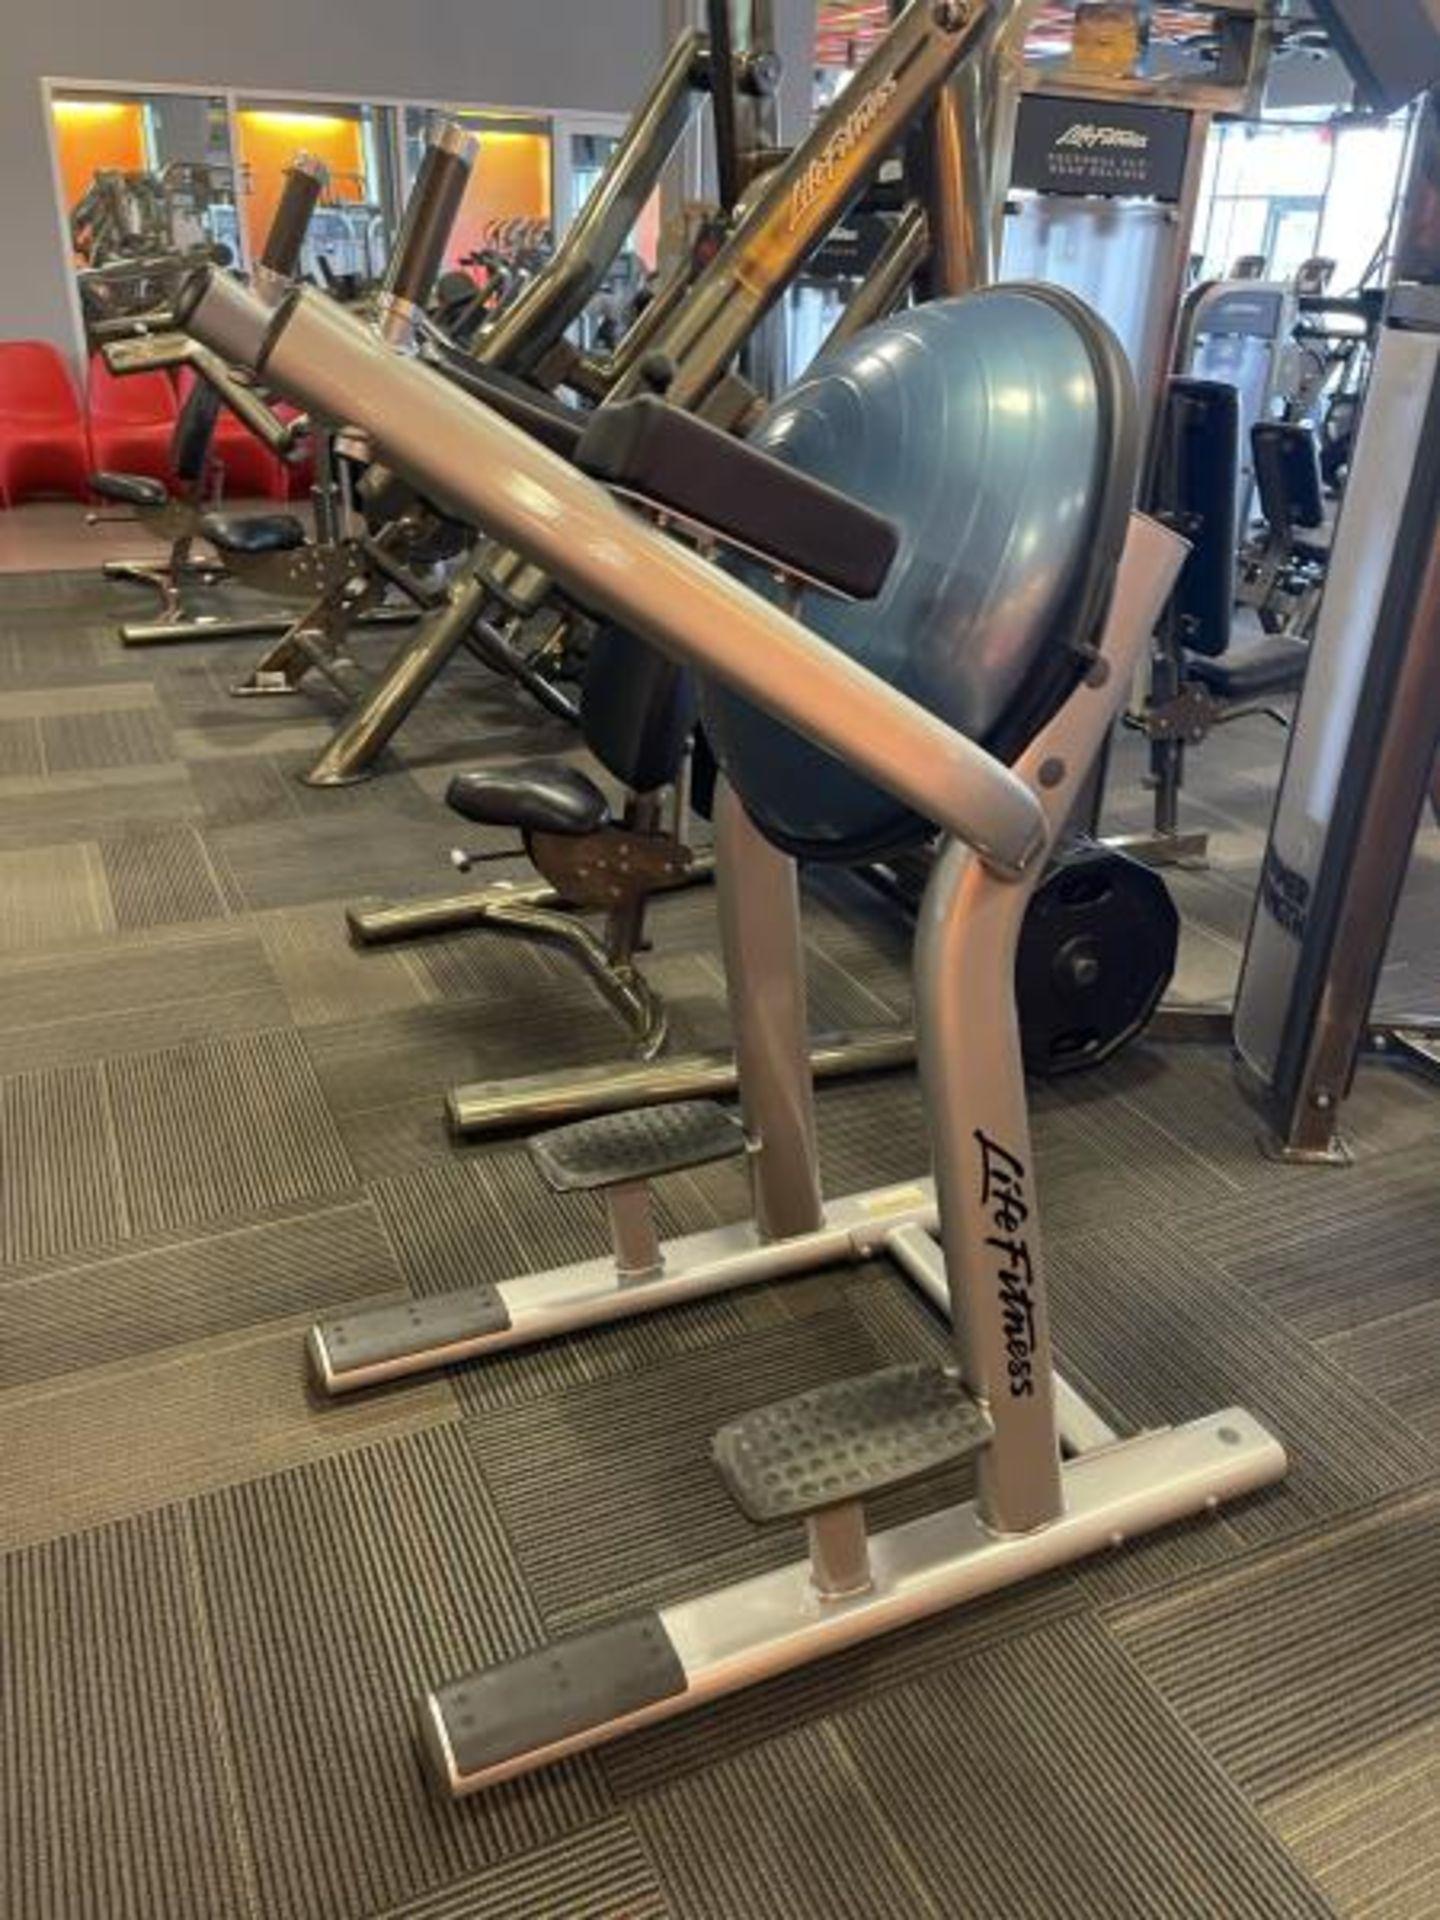 Life Fitness Bosu Balance Trainer M: SLR-0102-102 - Image 2 of 2